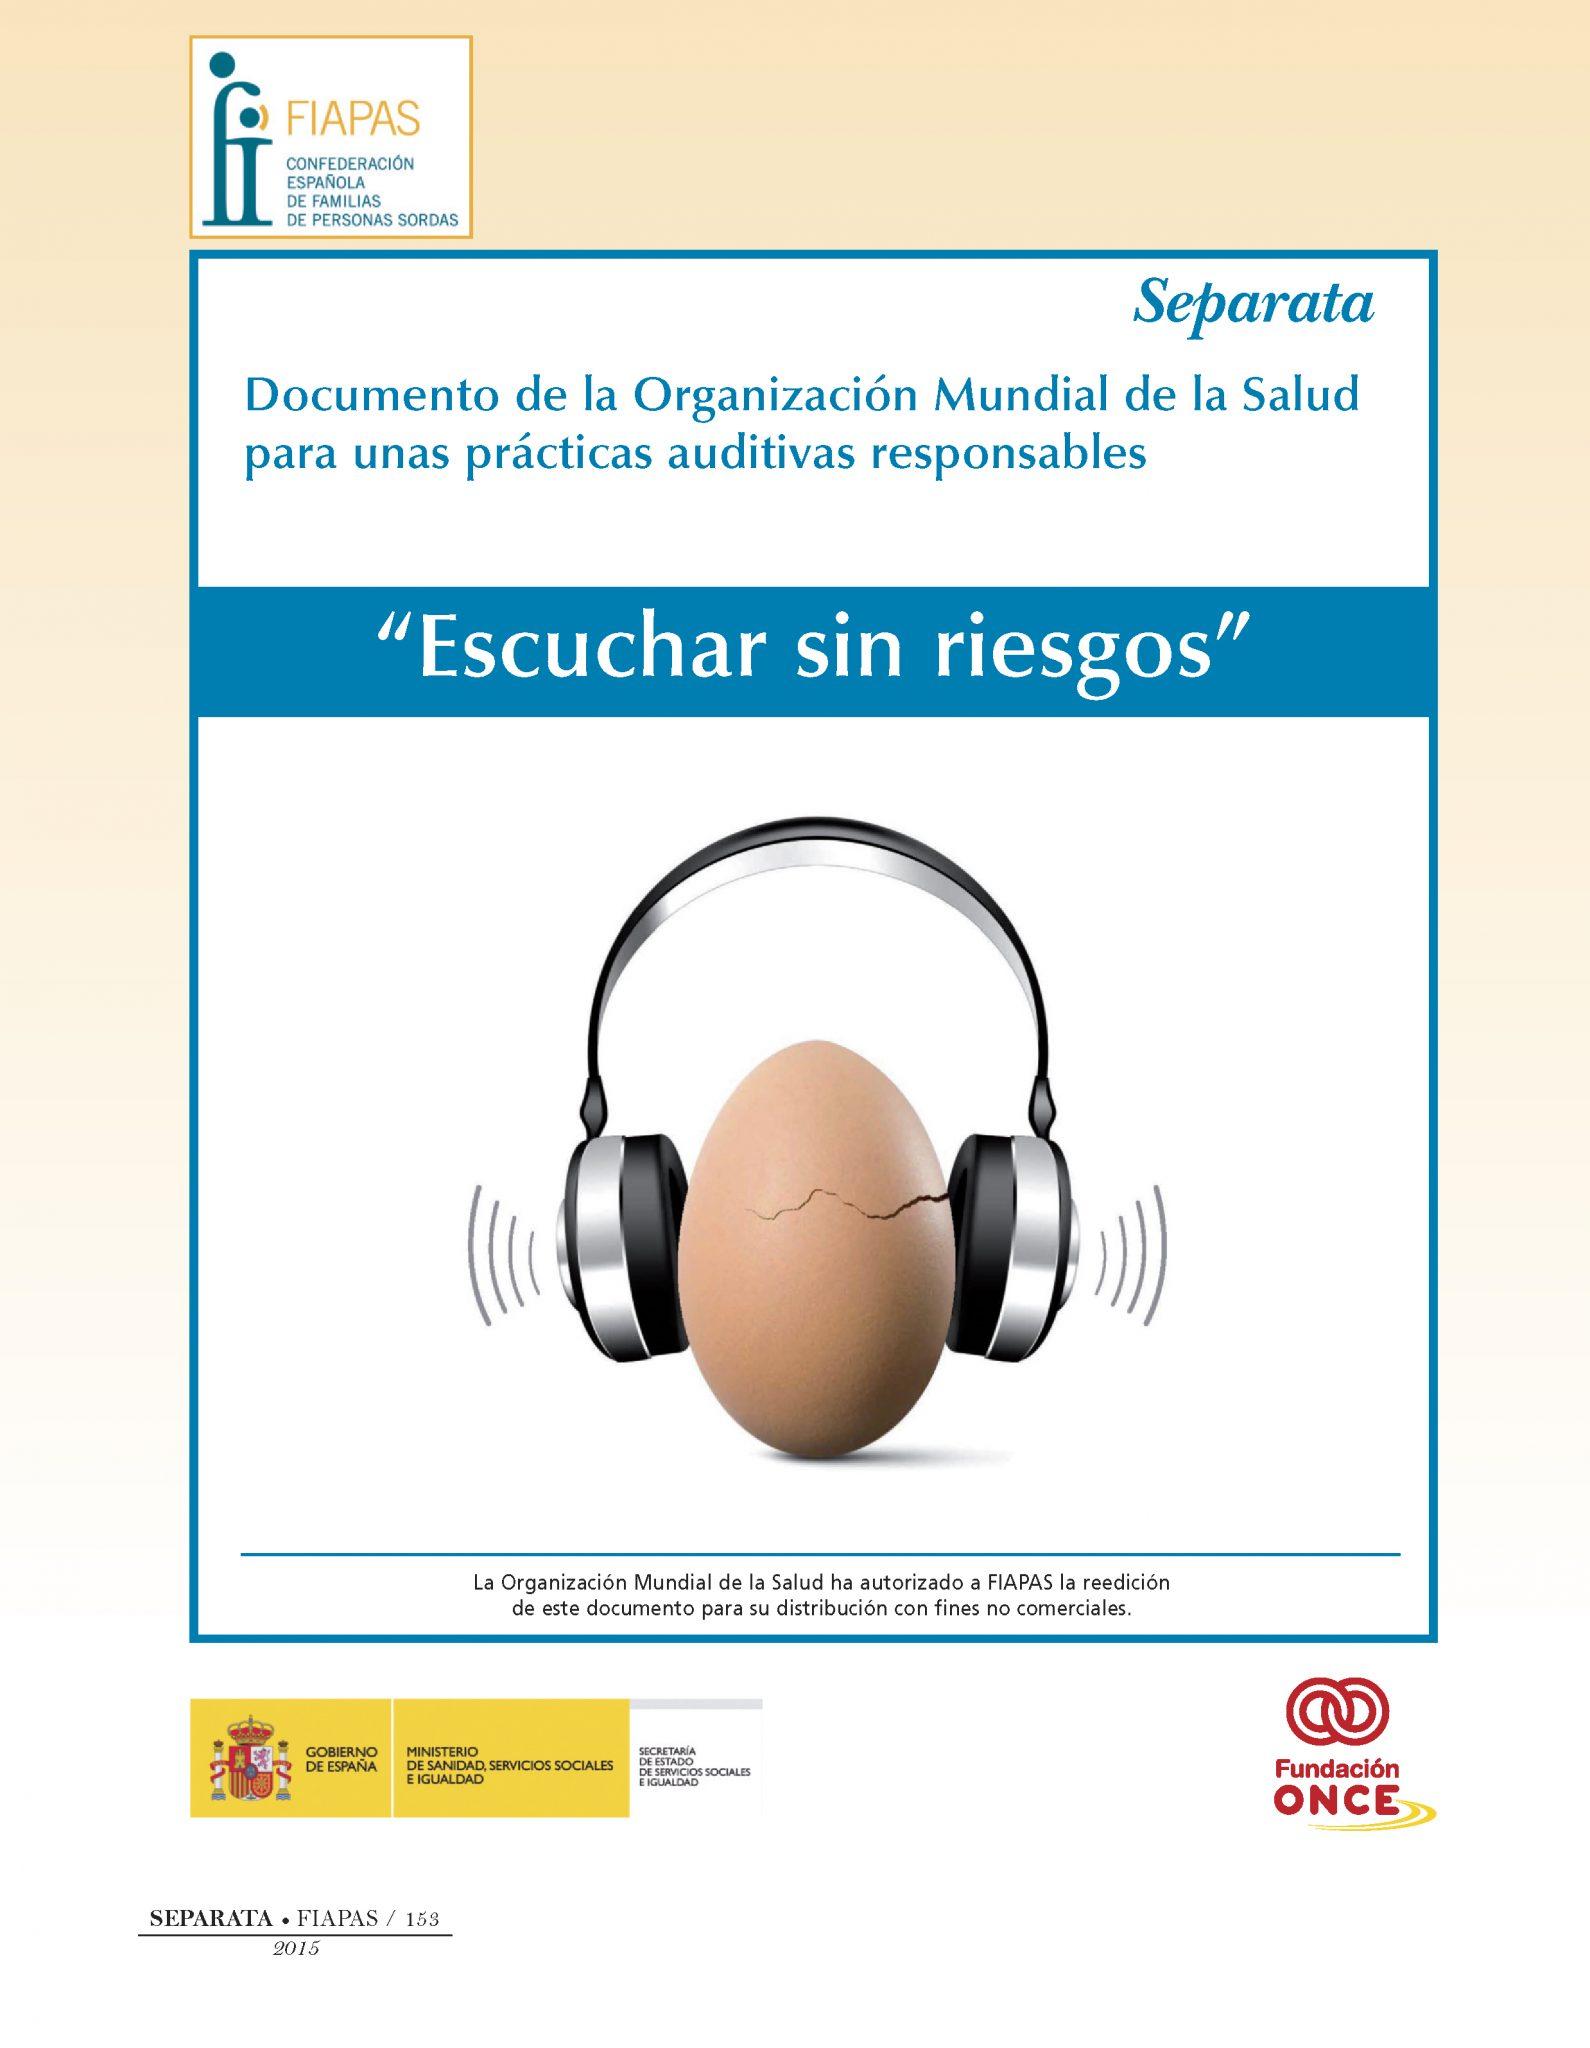 SEPARATA _FIAPAS_153